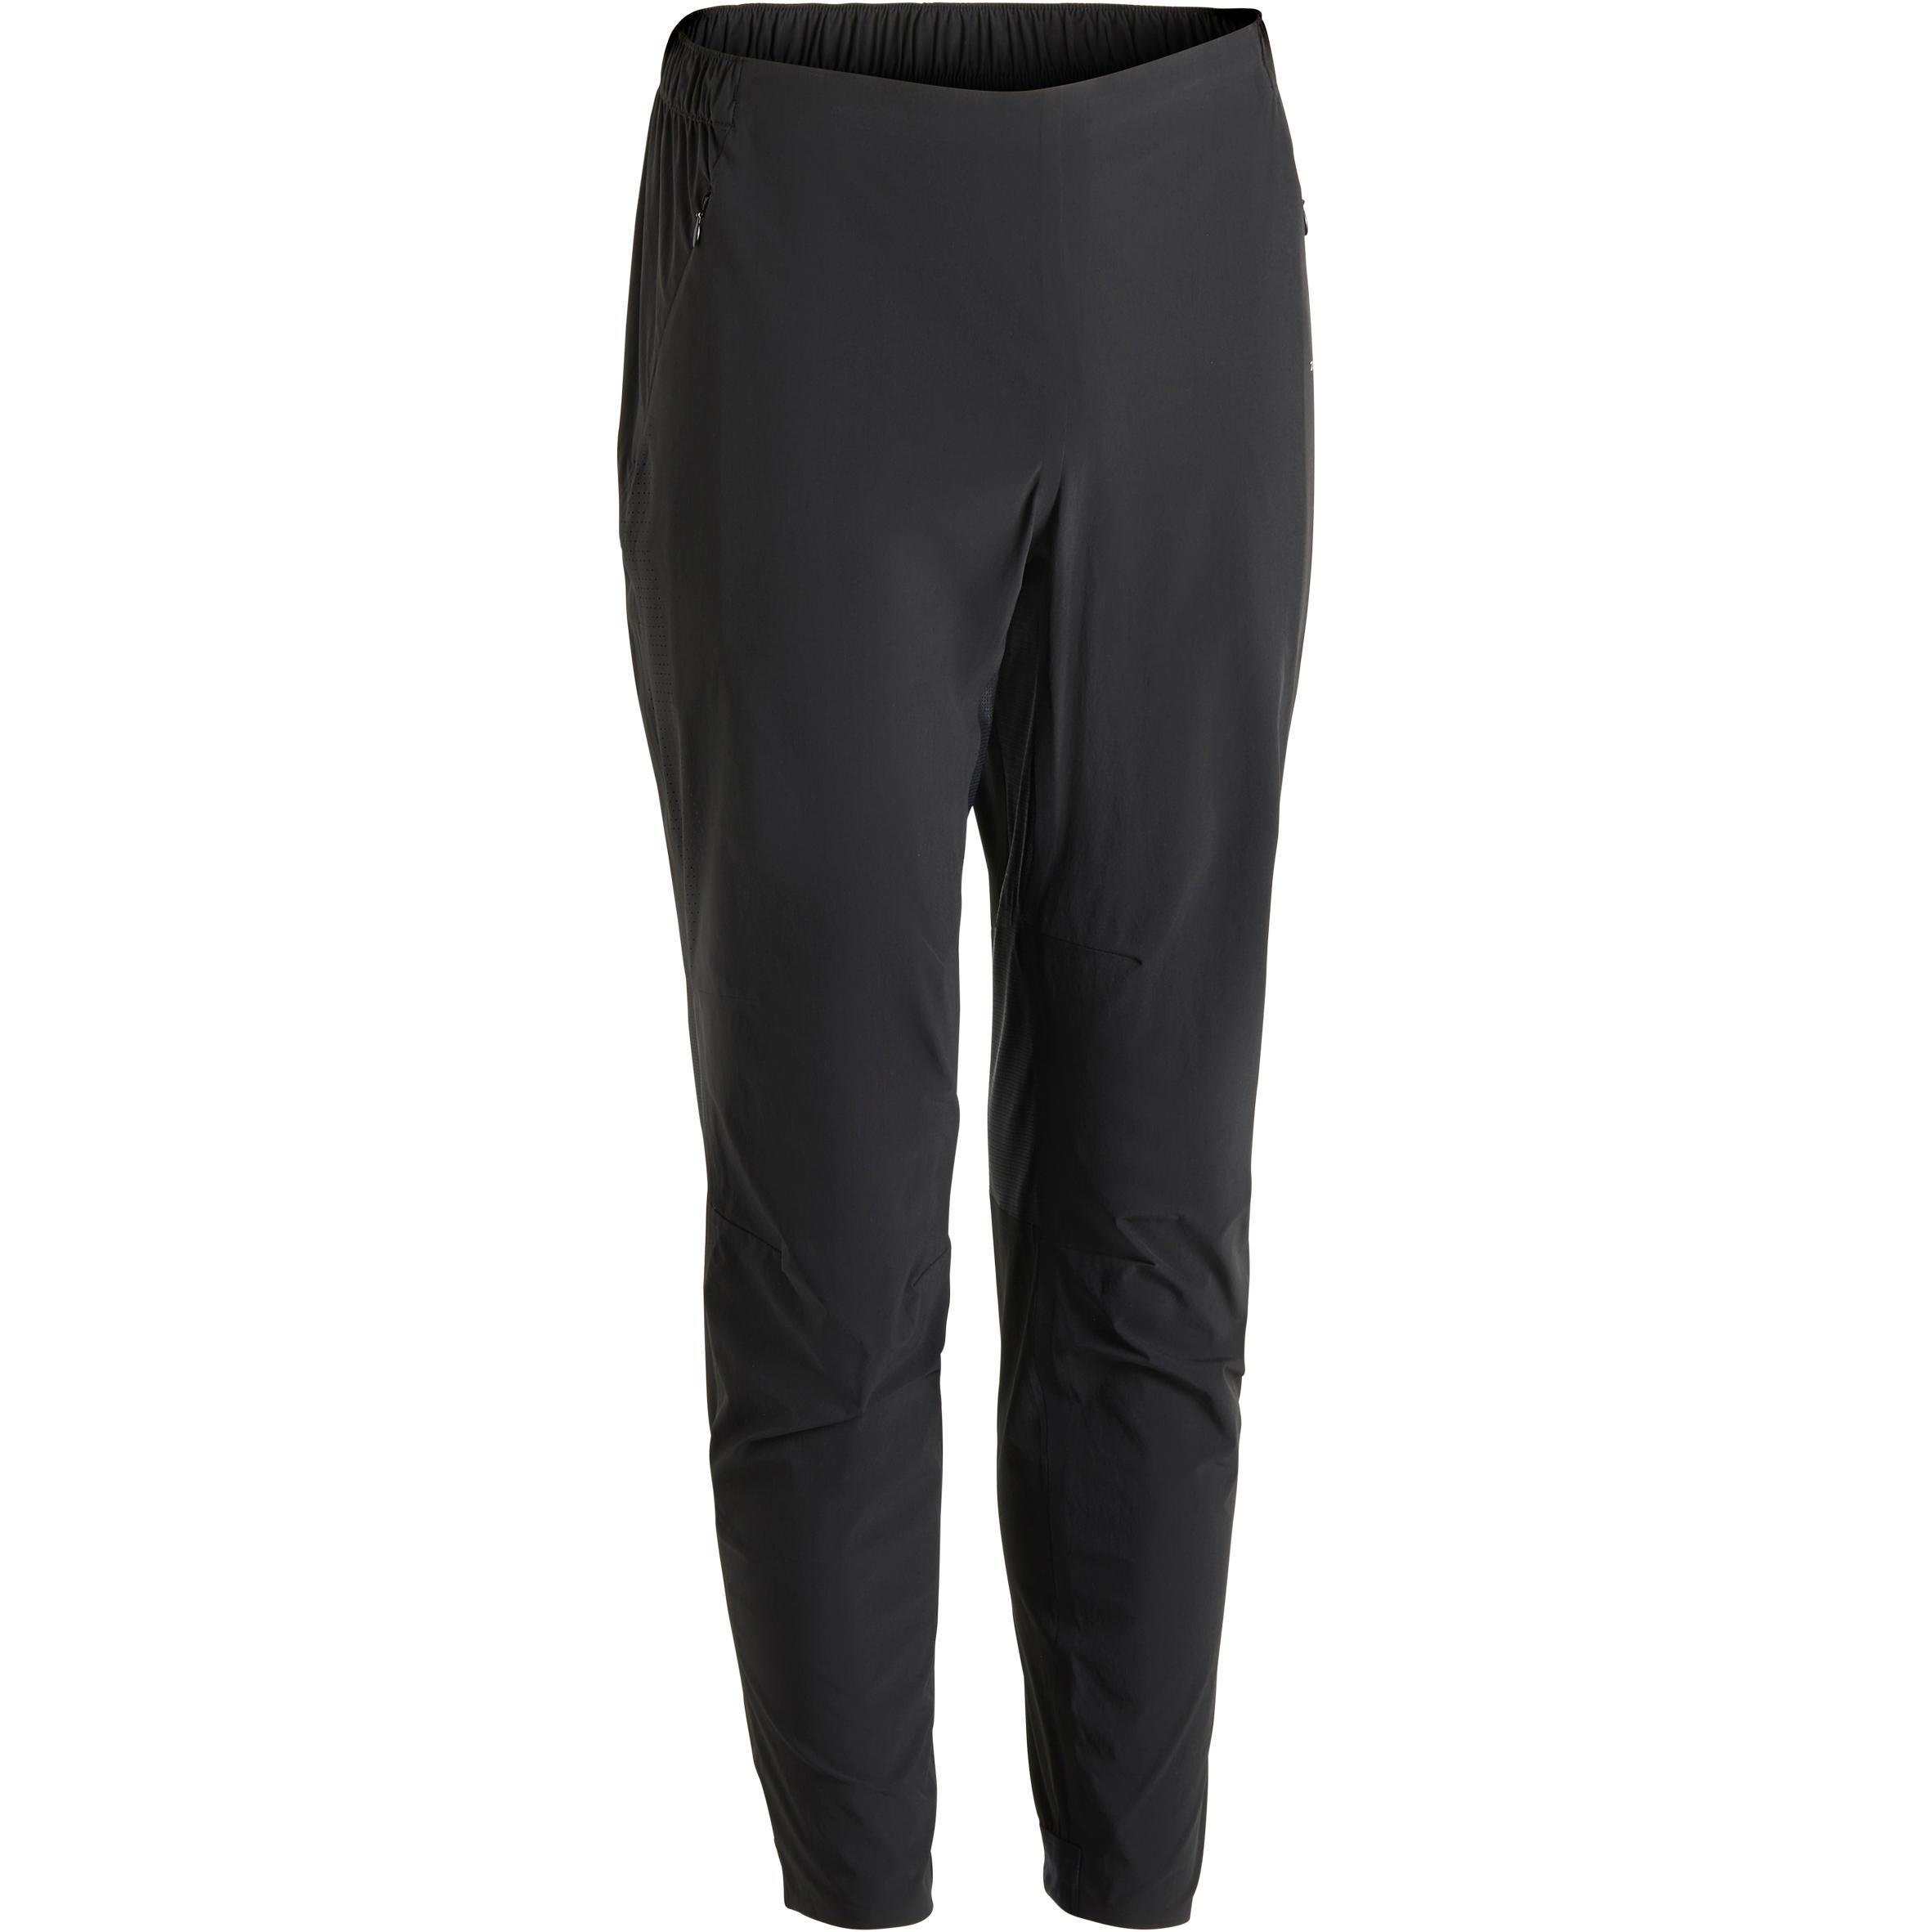 Pants fitness cardio hombre negro FPA900